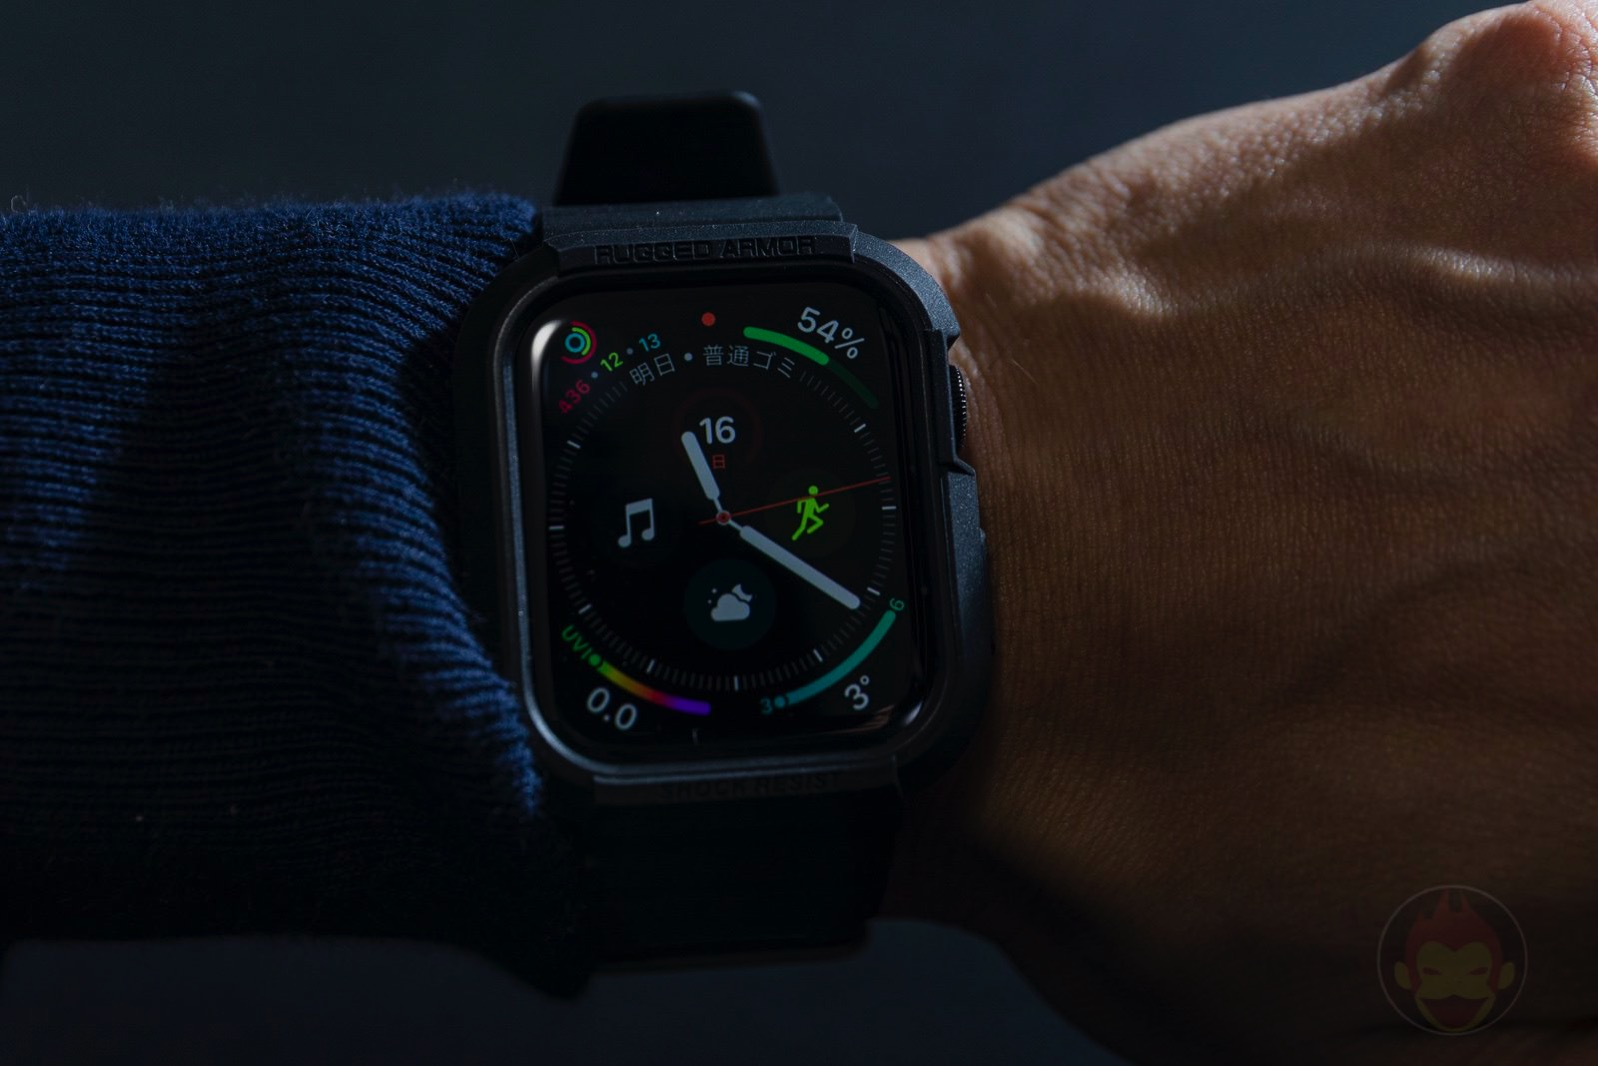 Spigen-Rugged-Armor-Pro-Apple-Watch-Band-and-case-14.jpg